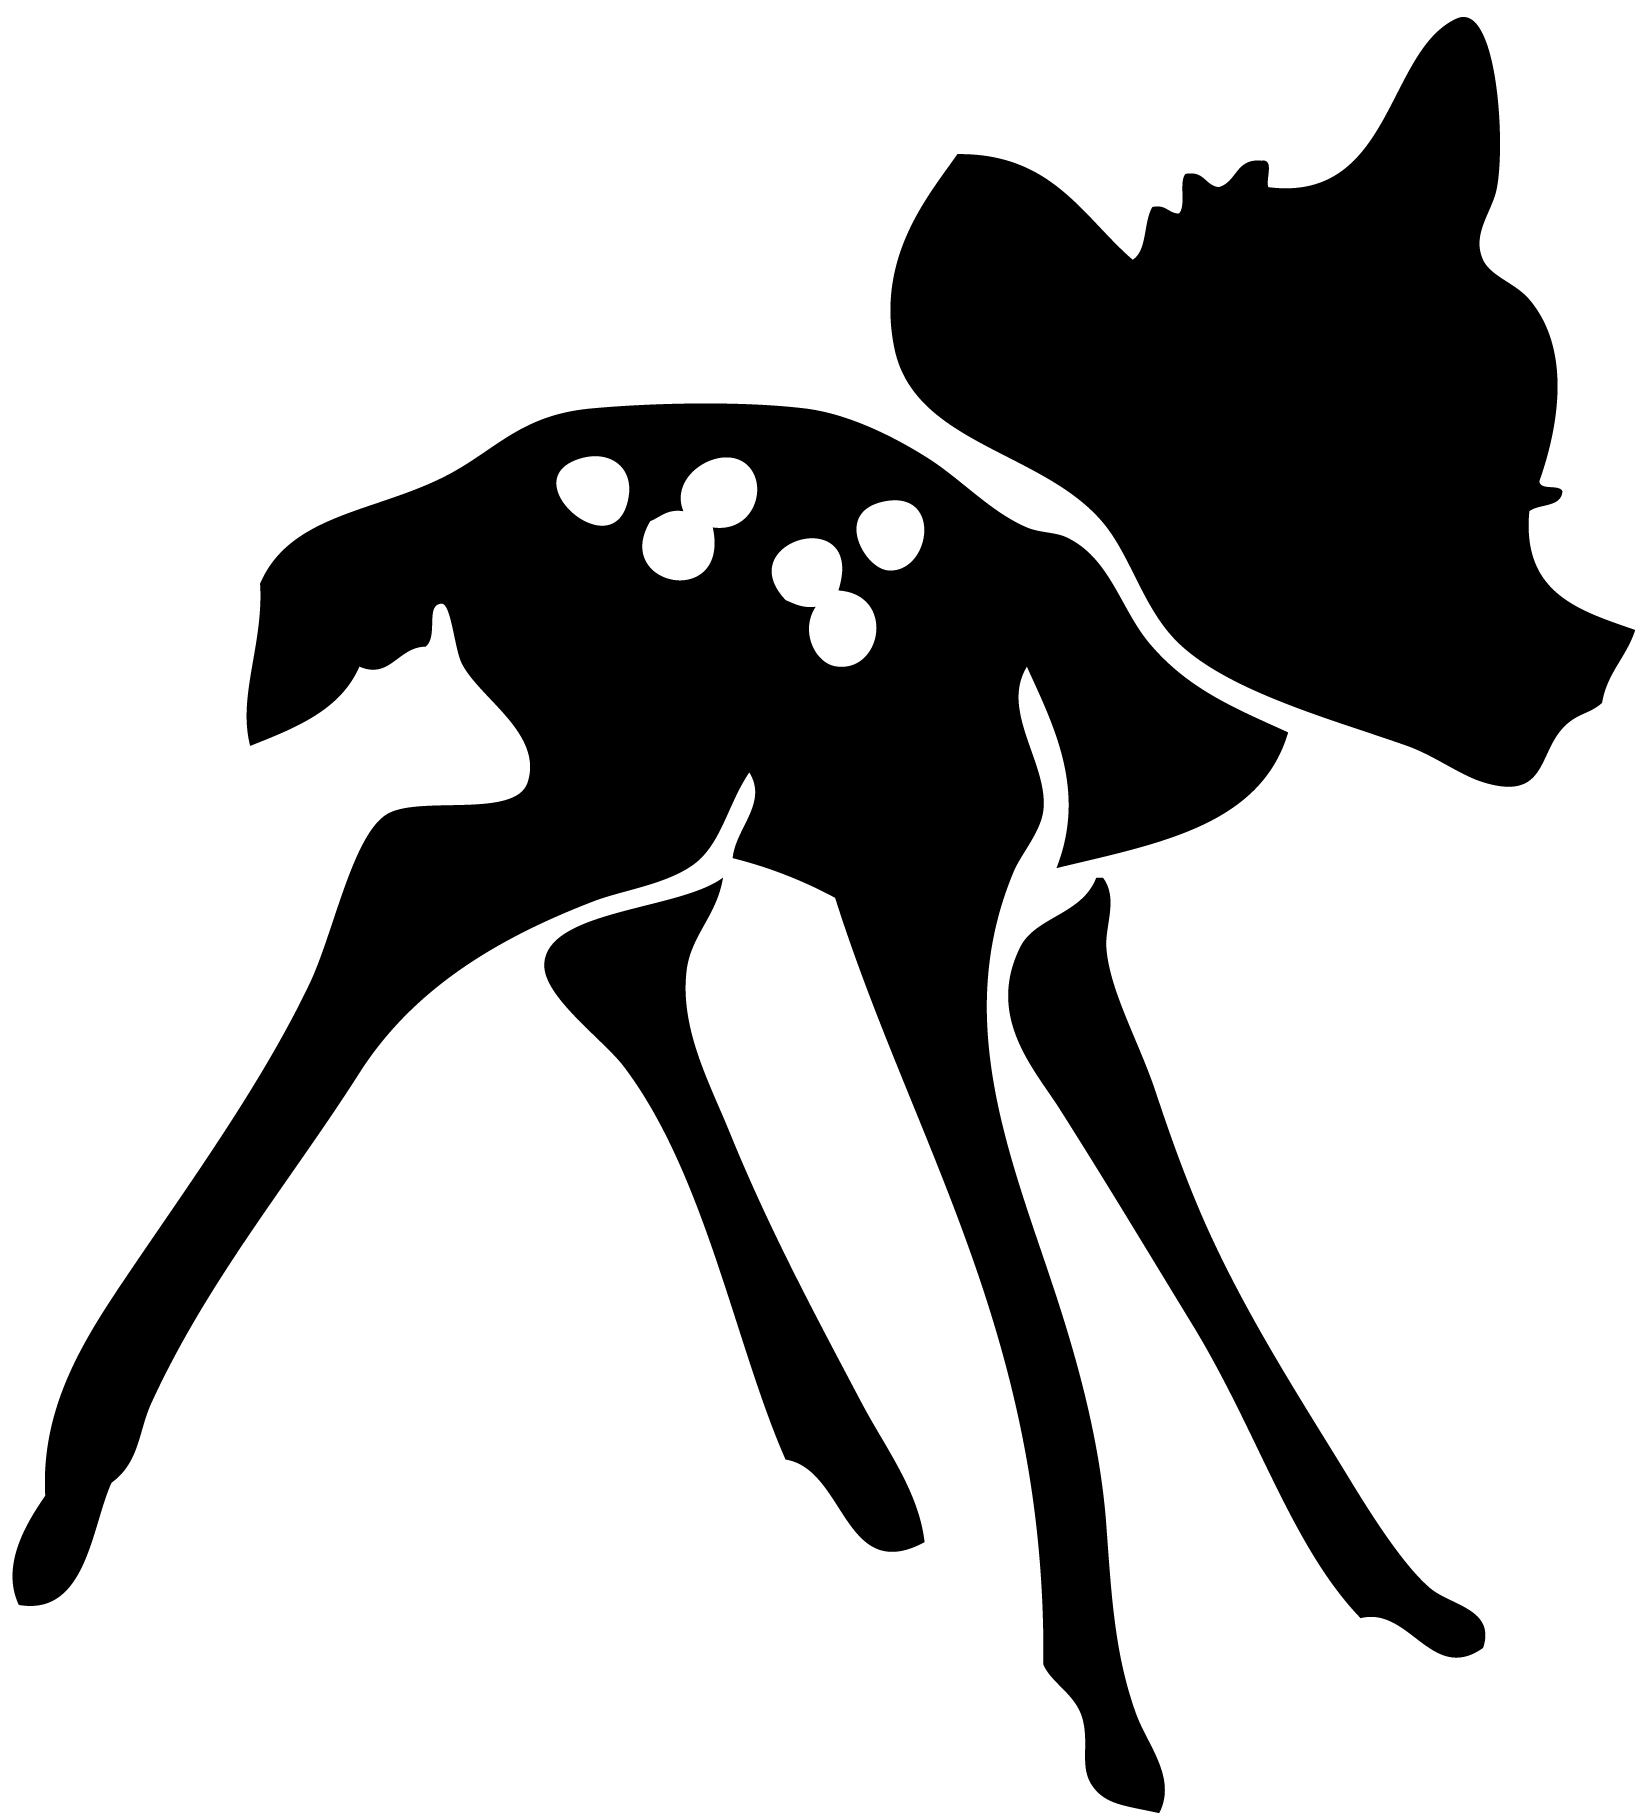 Stickers Bambi chambre enfant STICKERS SILHOUETTE Destock Stickers